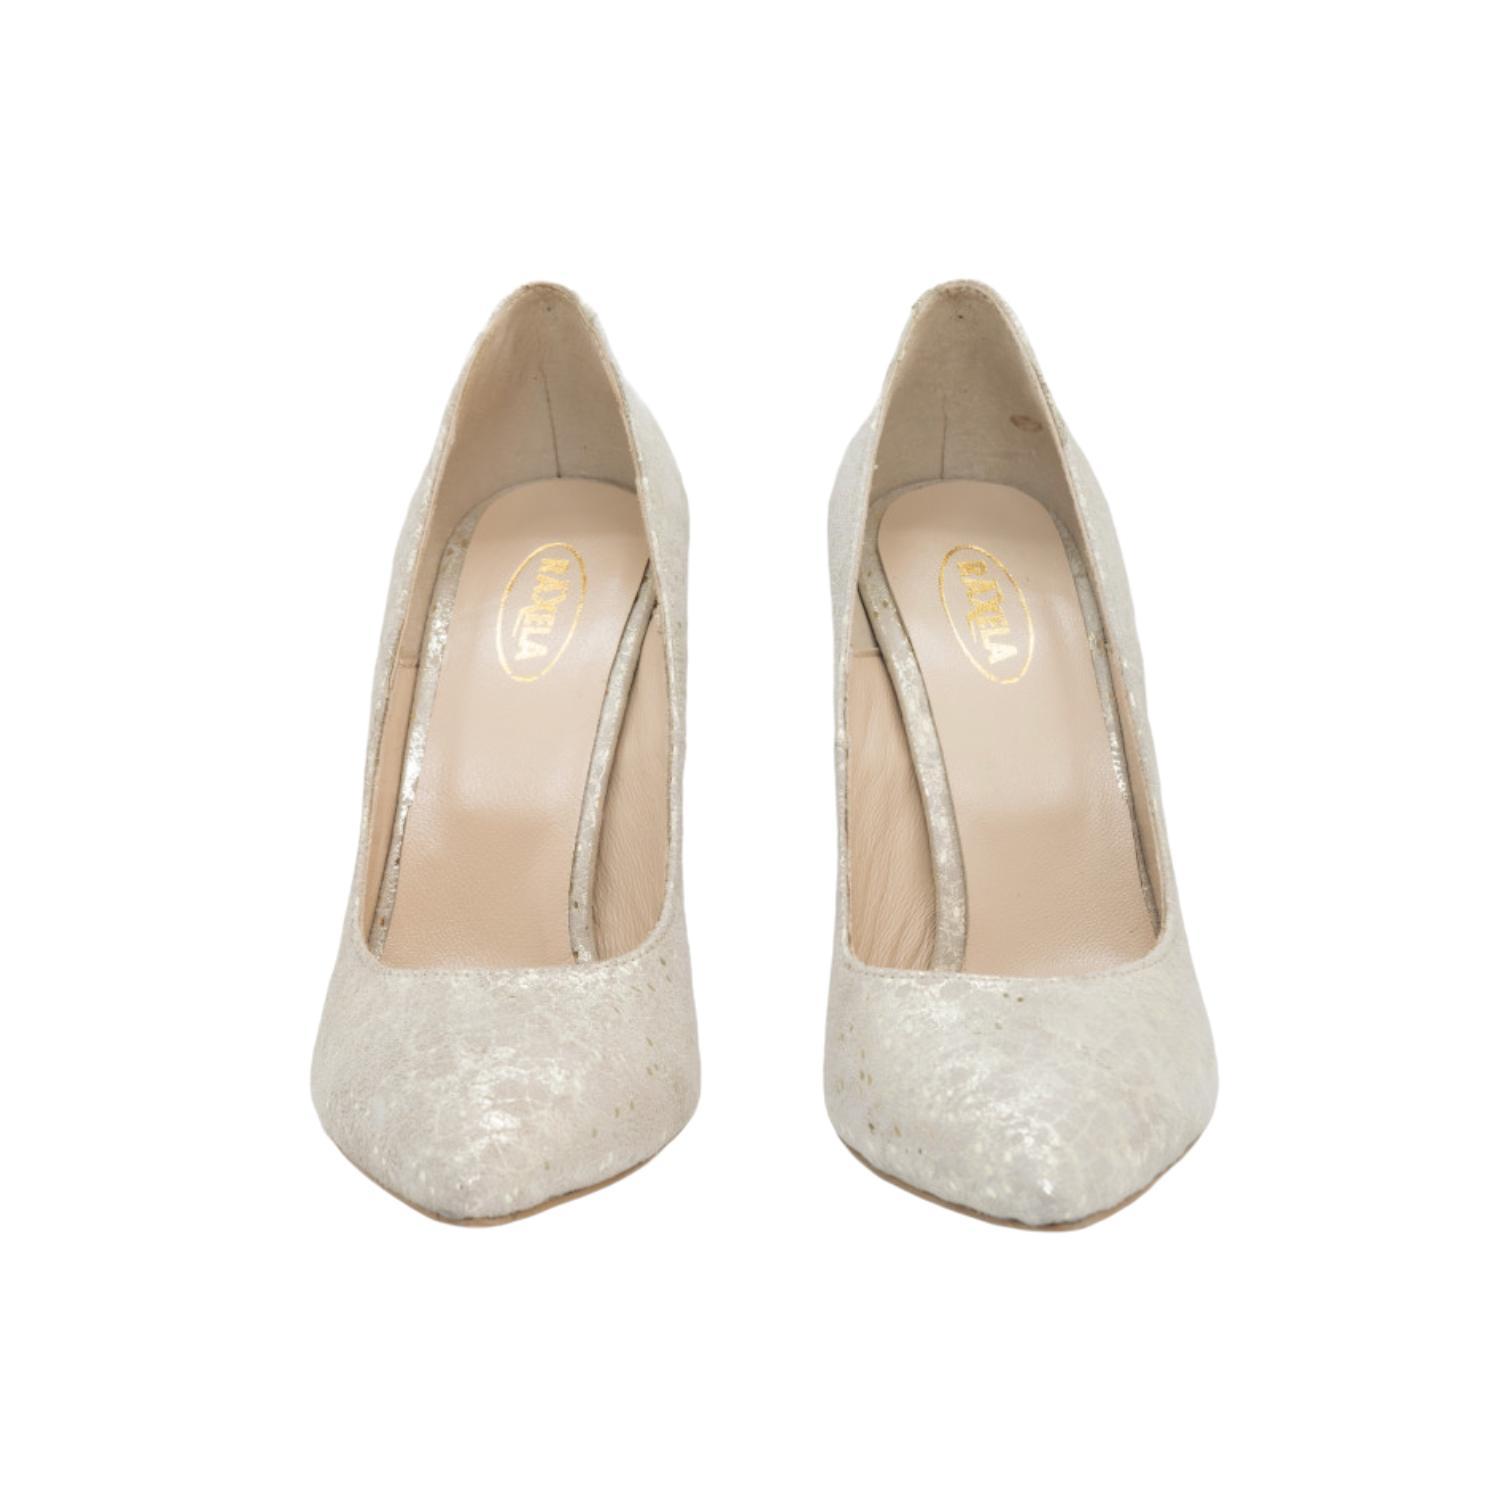 Pantofi aurii cu imprimeu abstract